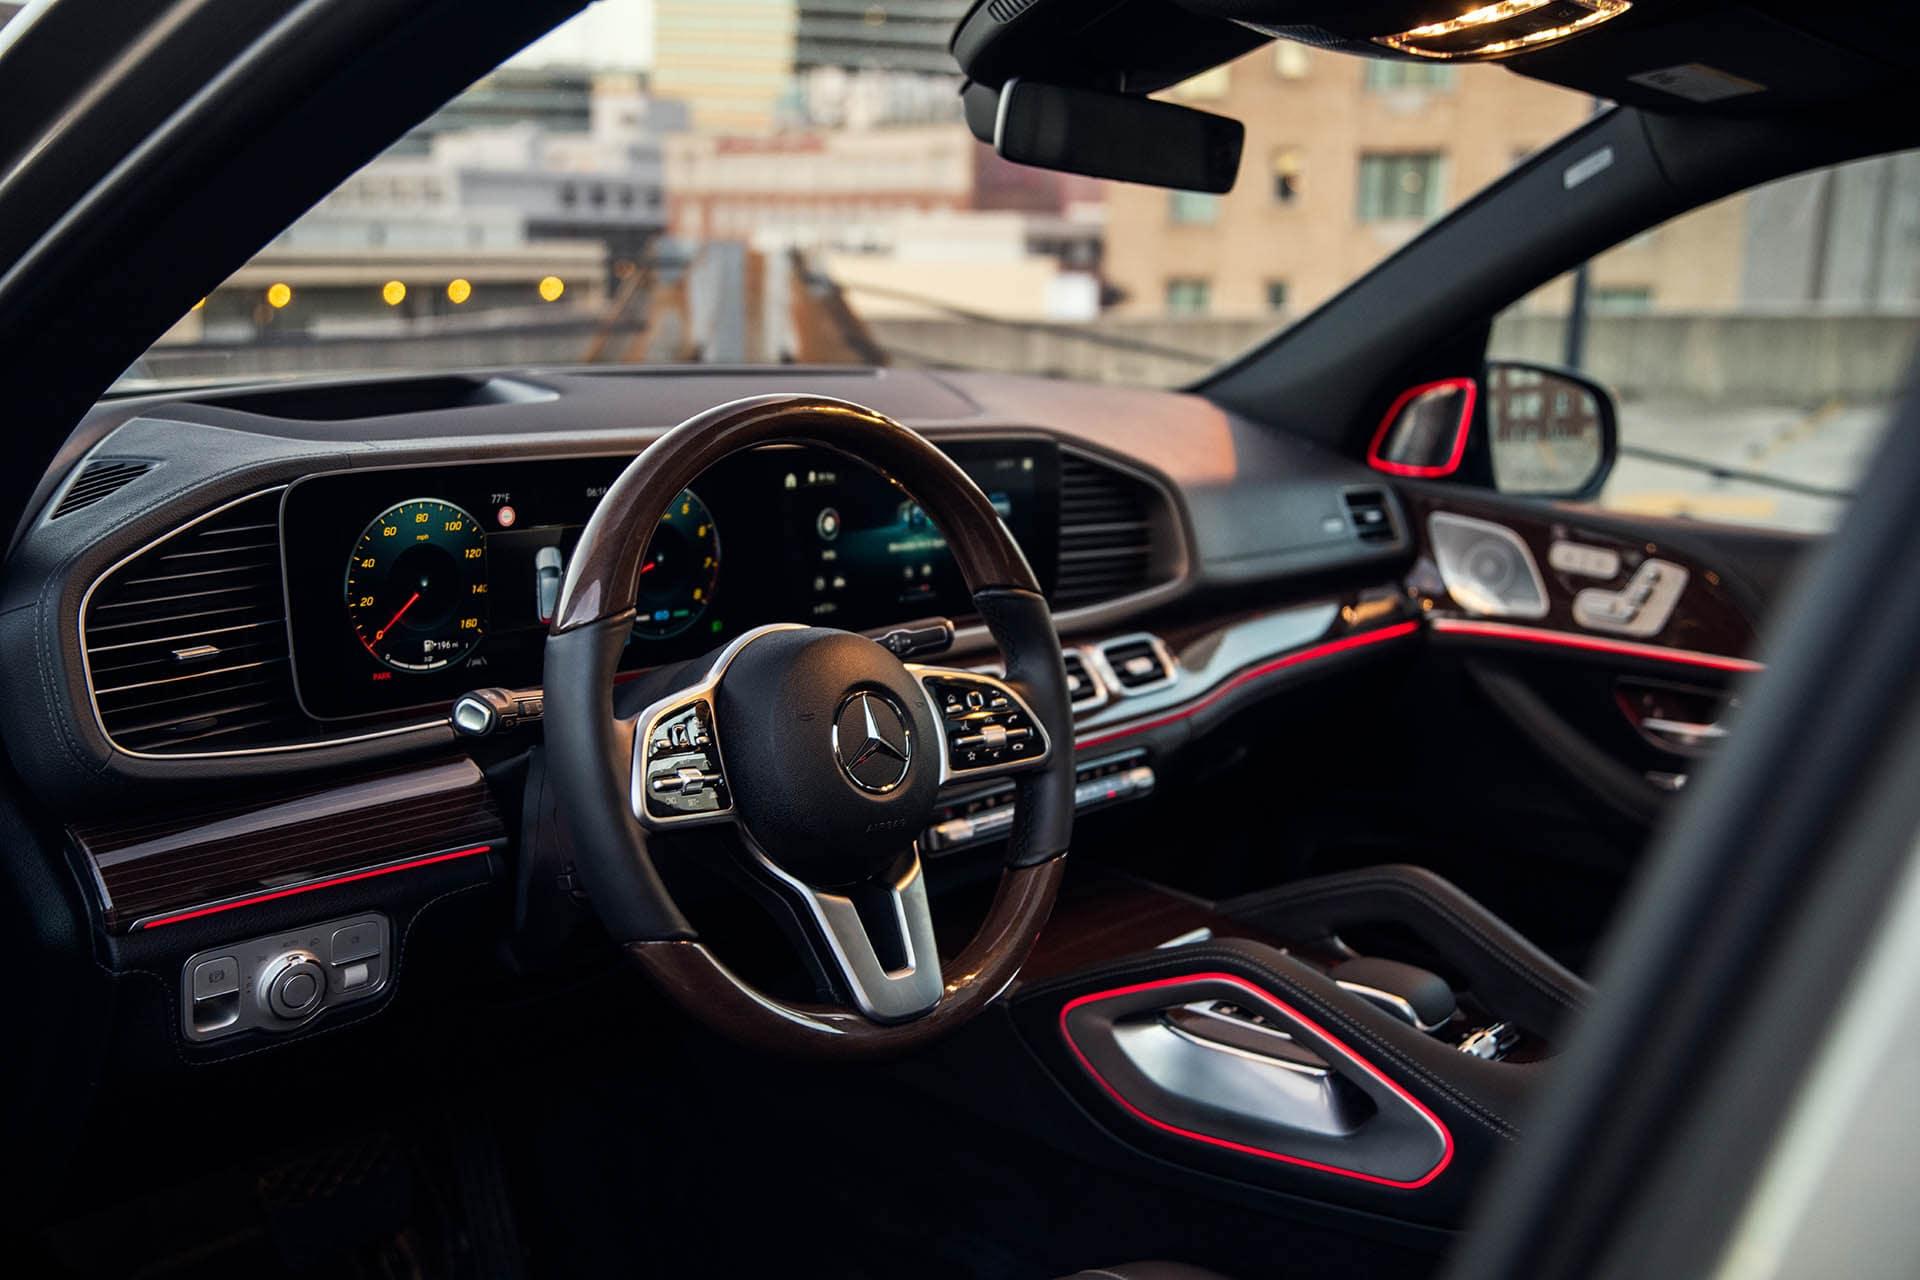 2020 Mercedes-Benz GLE   Mercedes-Benz of Myrtle Beach